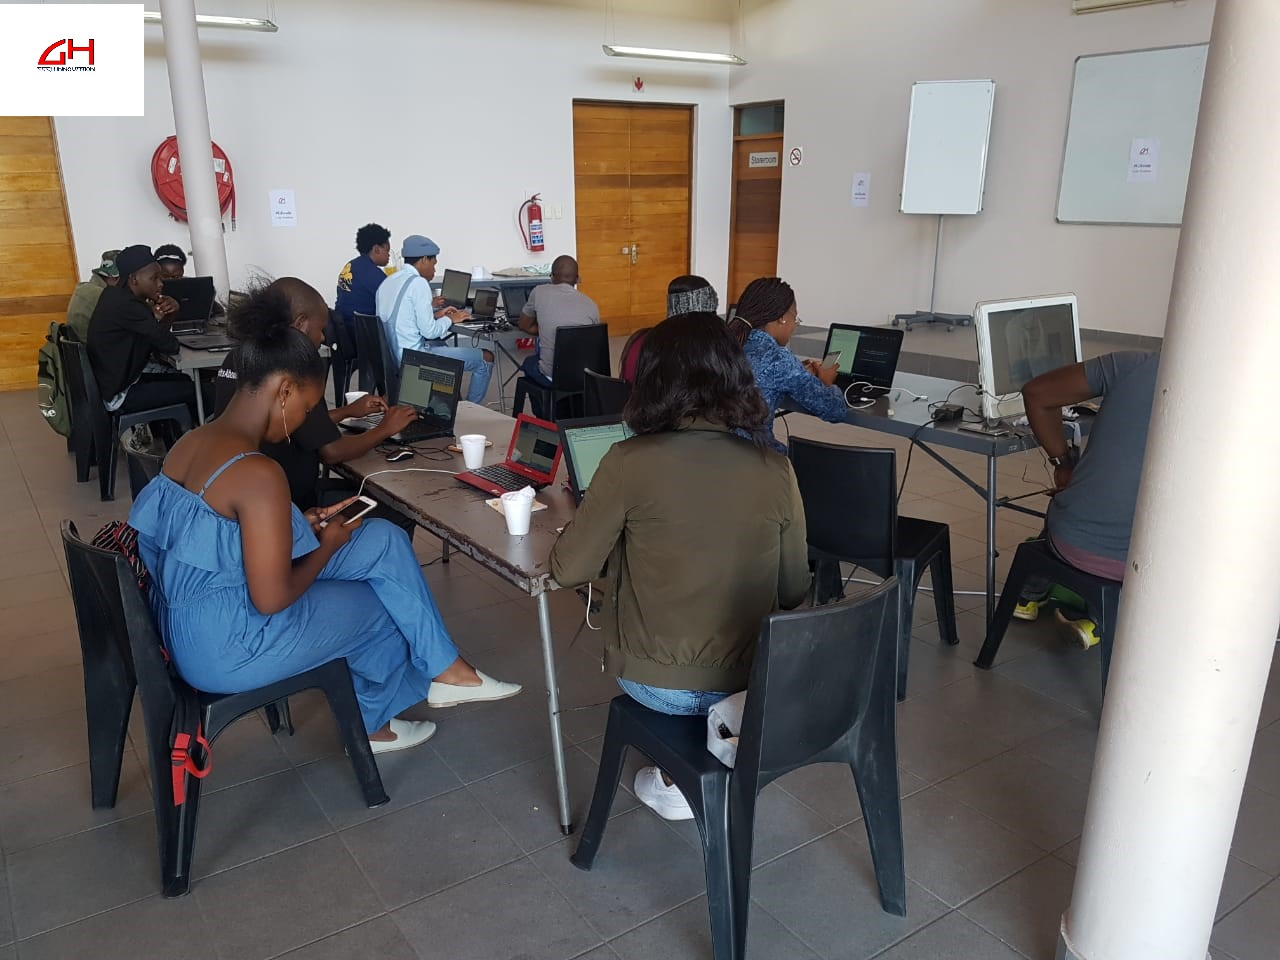 Ghetto Heroes Tech Innovation Diketso Setho